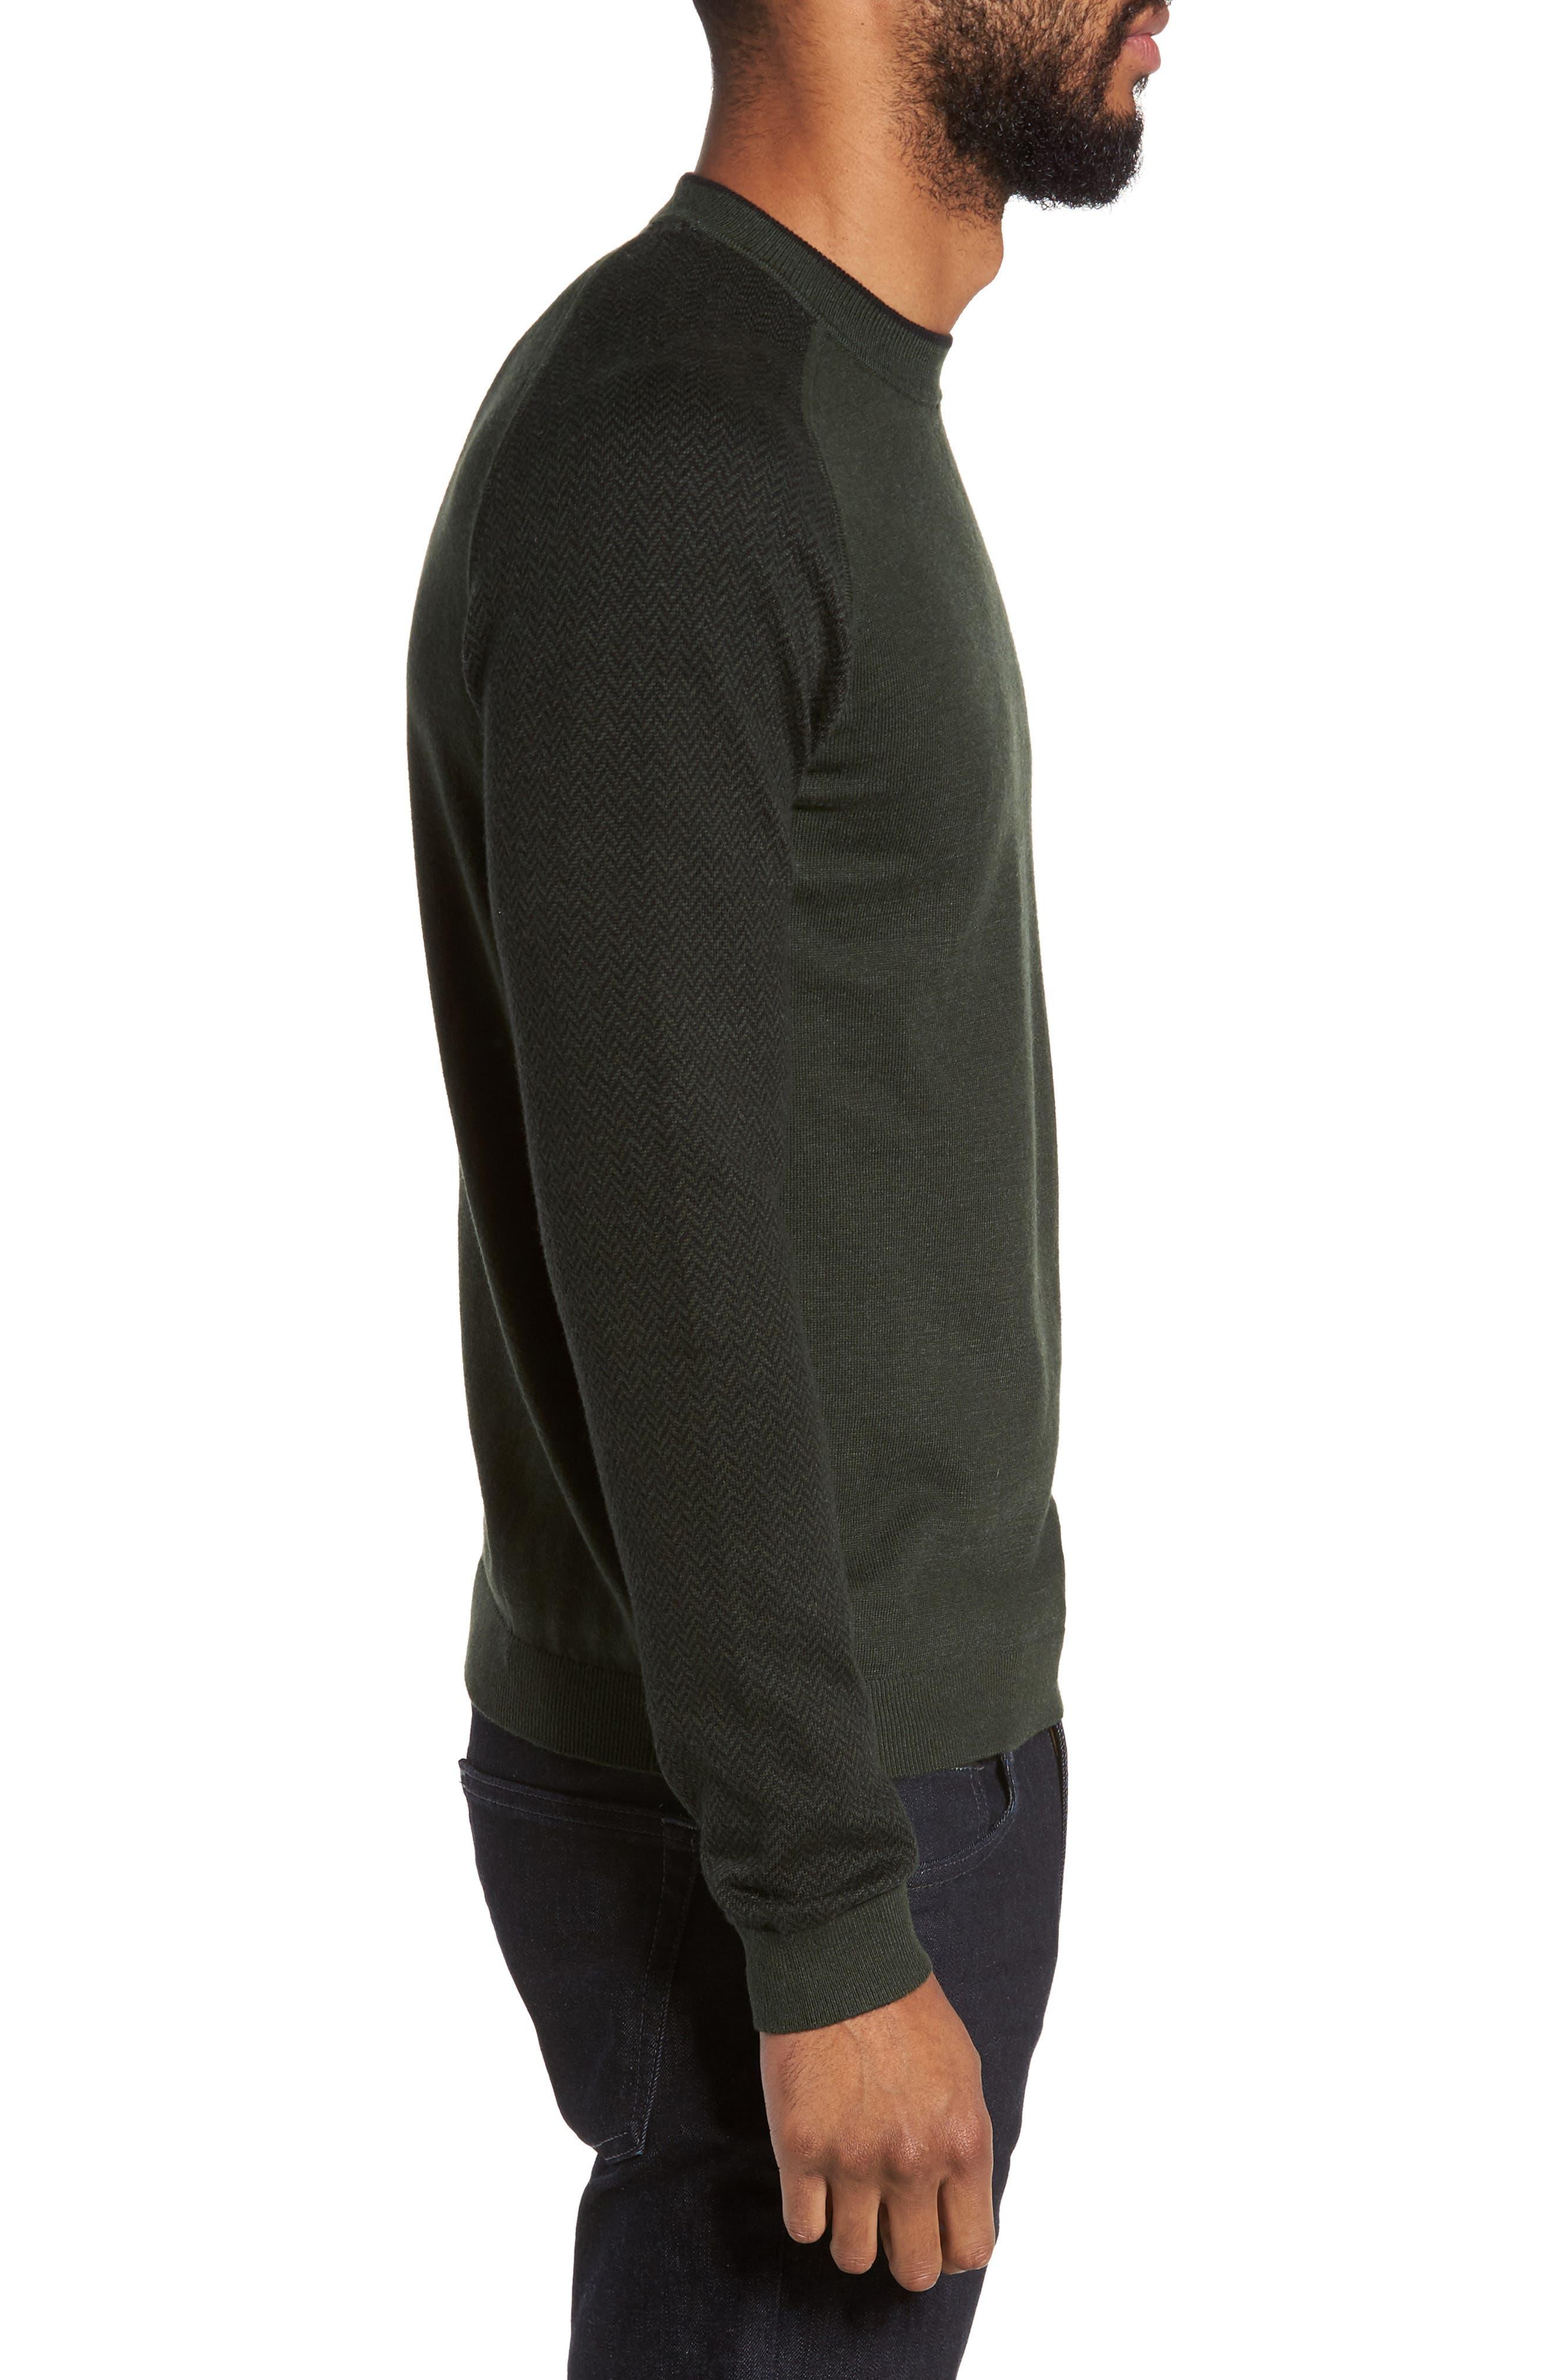 Pepmint Herringbone Sleeve Sweatshirt,                             Alternate thumbnail 3, color,                             Khaki